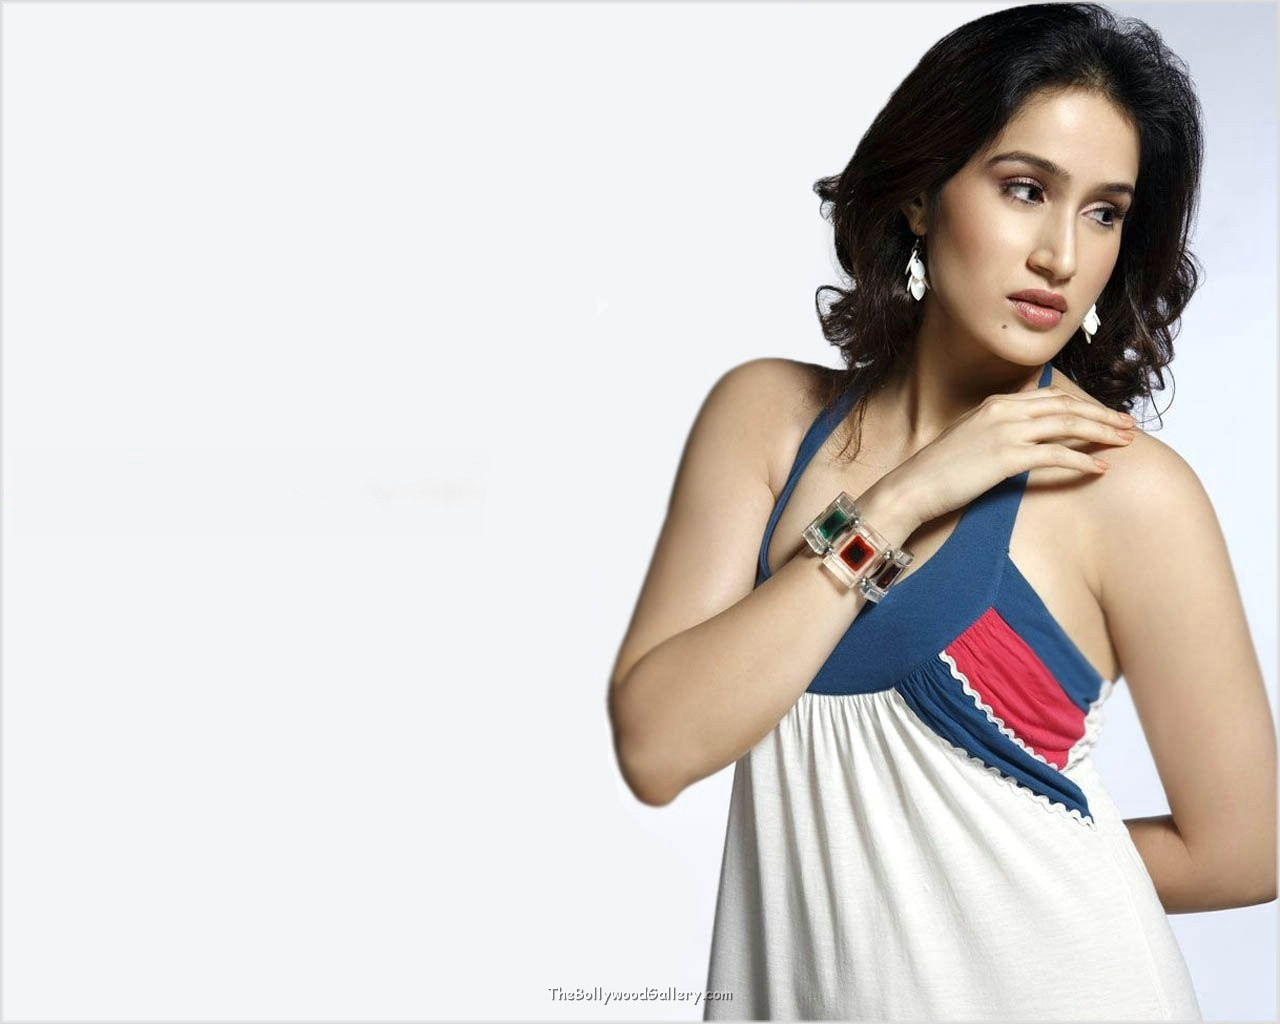 Sagarika Ghatge Bollywood Actress Hot Wallpapers - Funclub